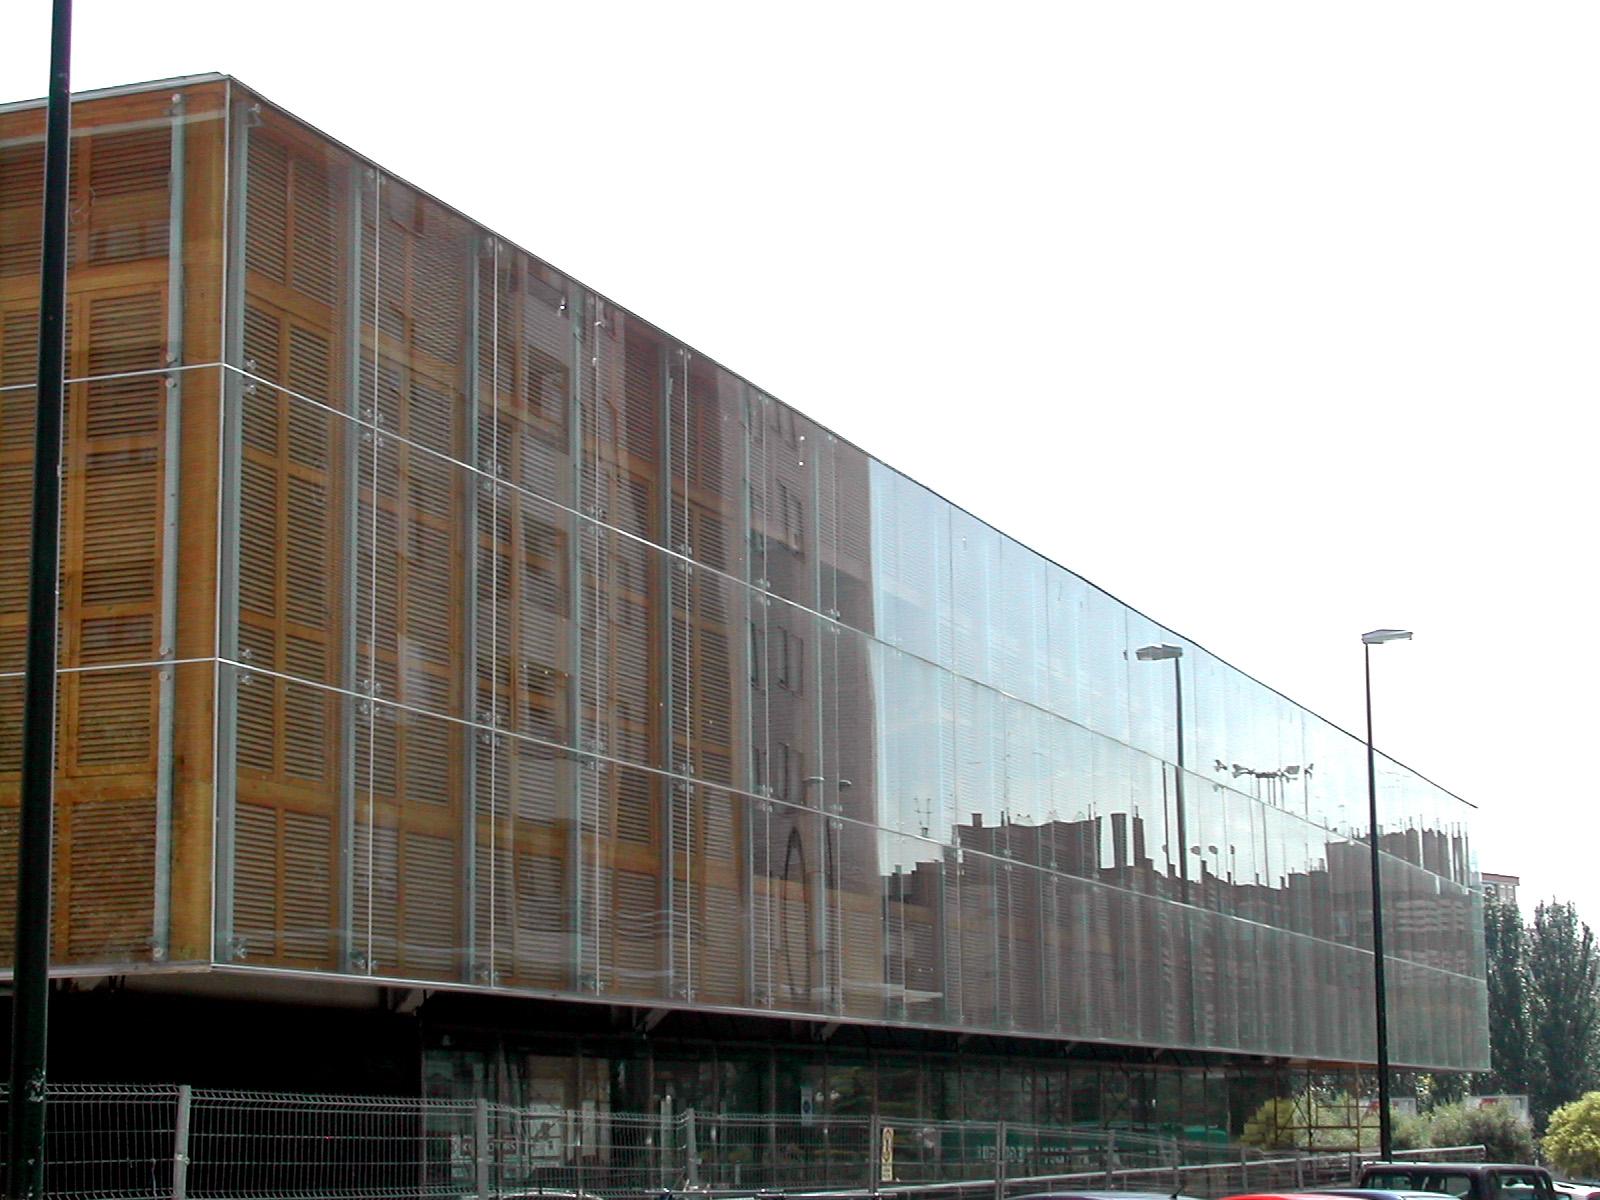 Obra 2004 edificio de oficinas zaragoza - Edificio de oficinas ...